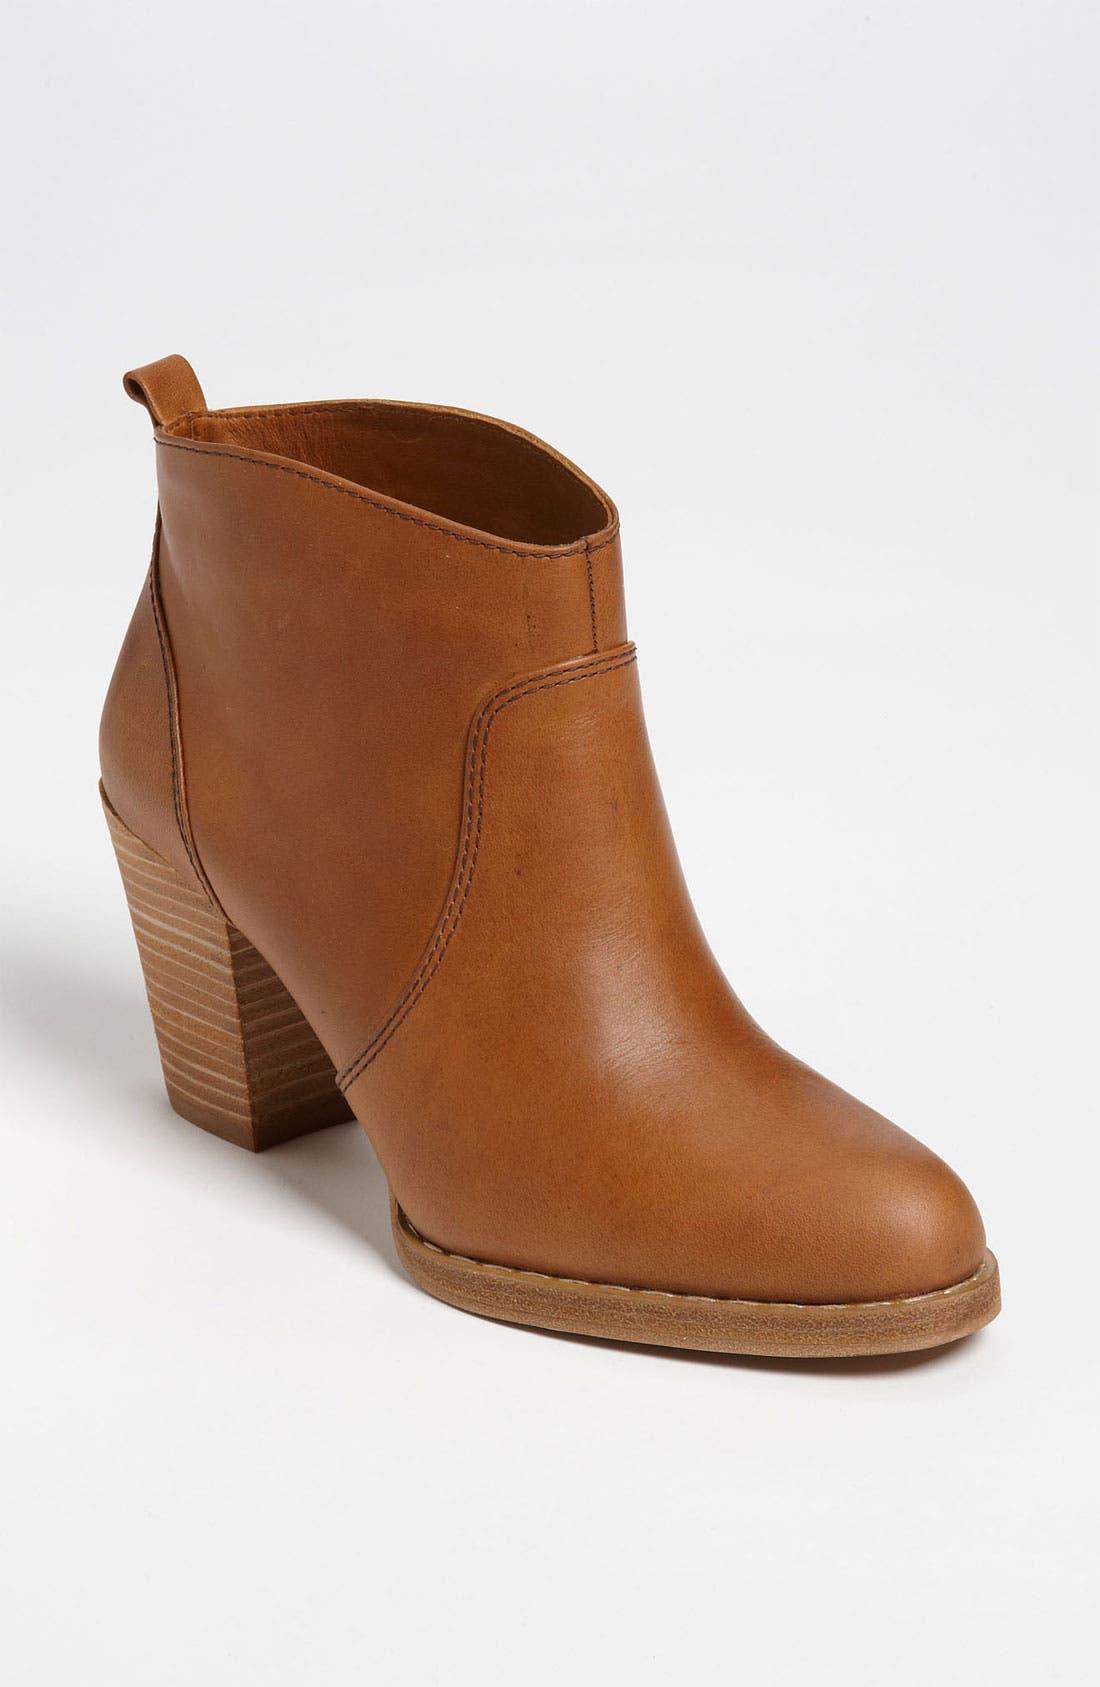 Main Image - KORS Michael Kors 'Wayland' Boot